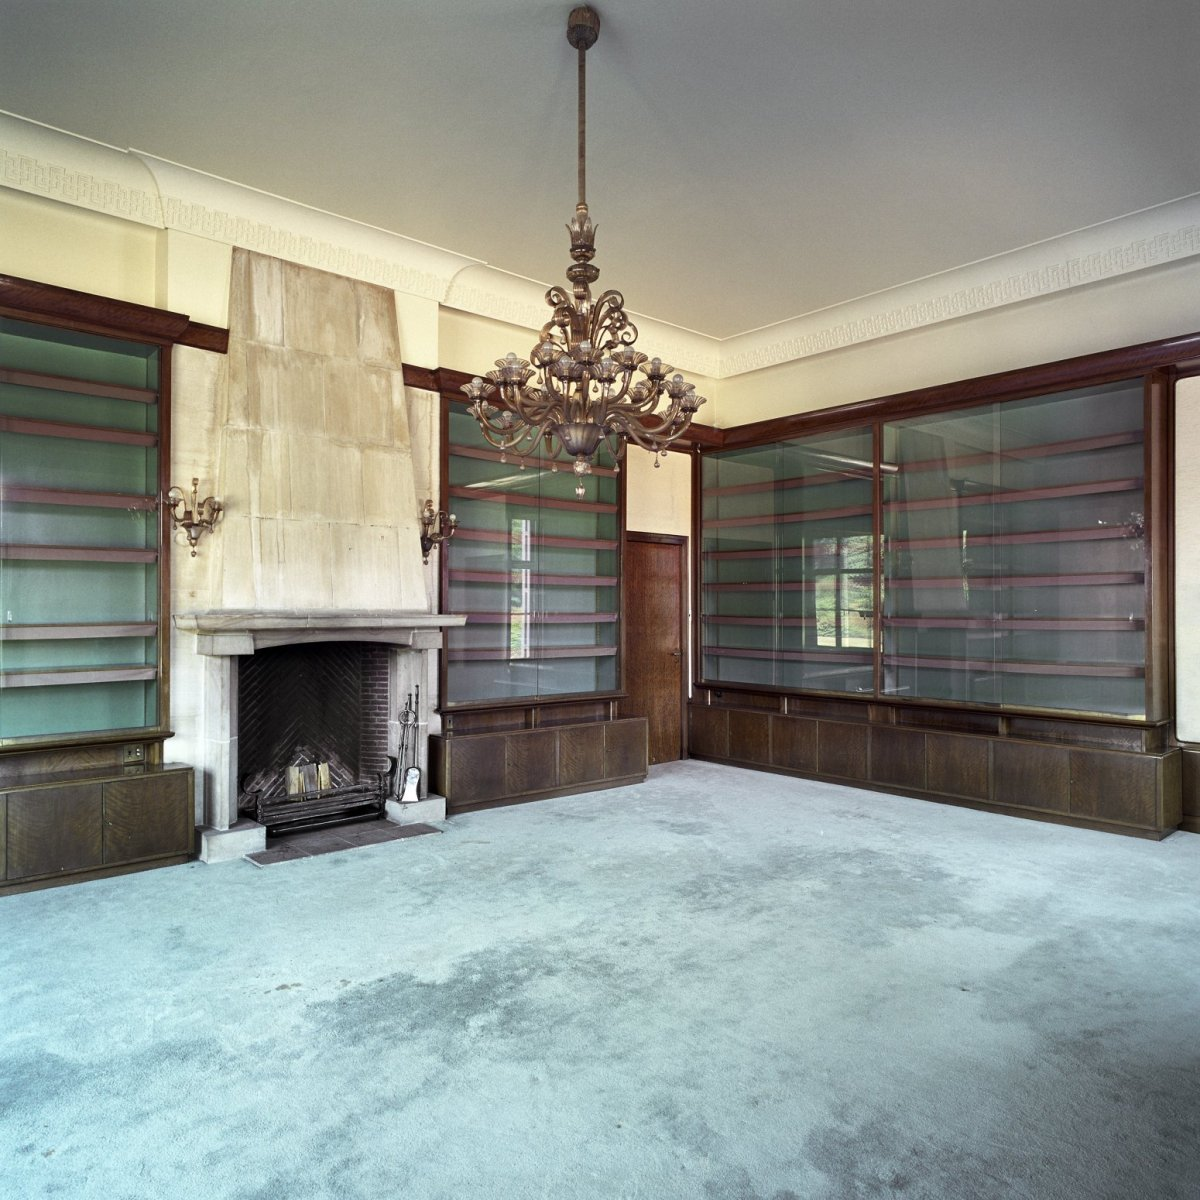 File interieur overzicht van de lege bibliotheek annex for Interieur woonkamer